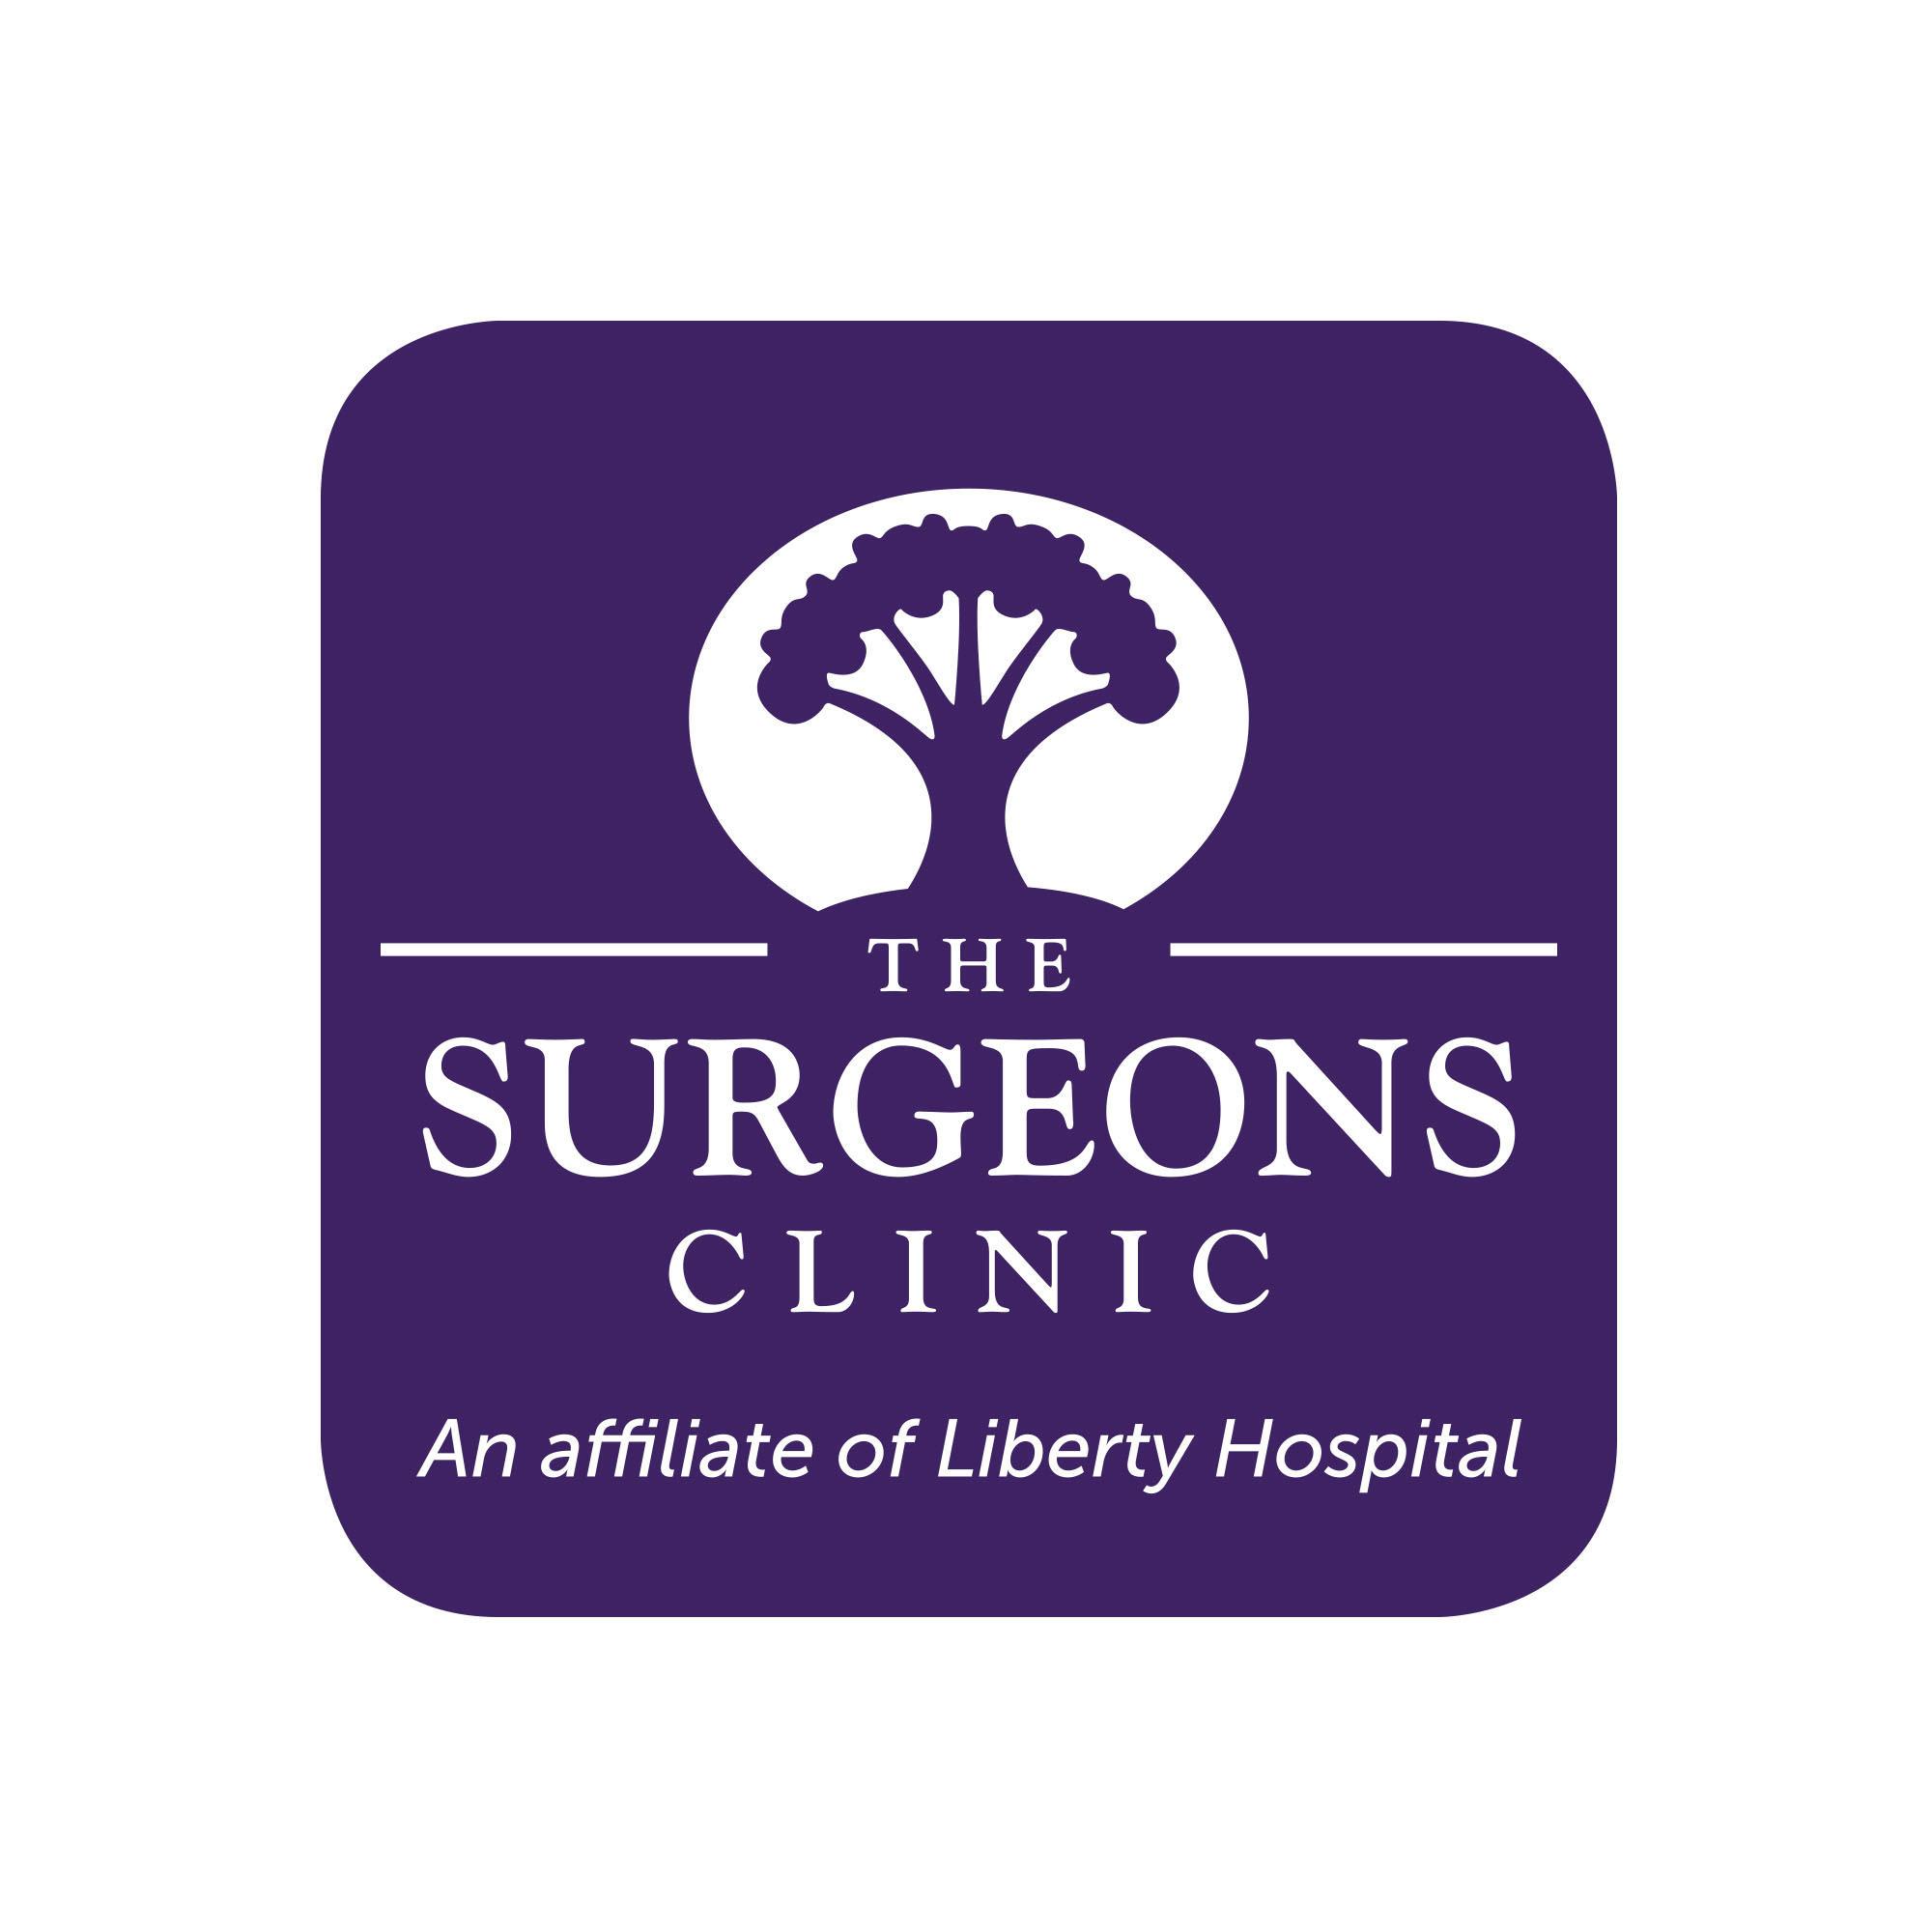 The Surgeons Clinic 2521 Glenn Hendren Dr Suite 108 Liberty